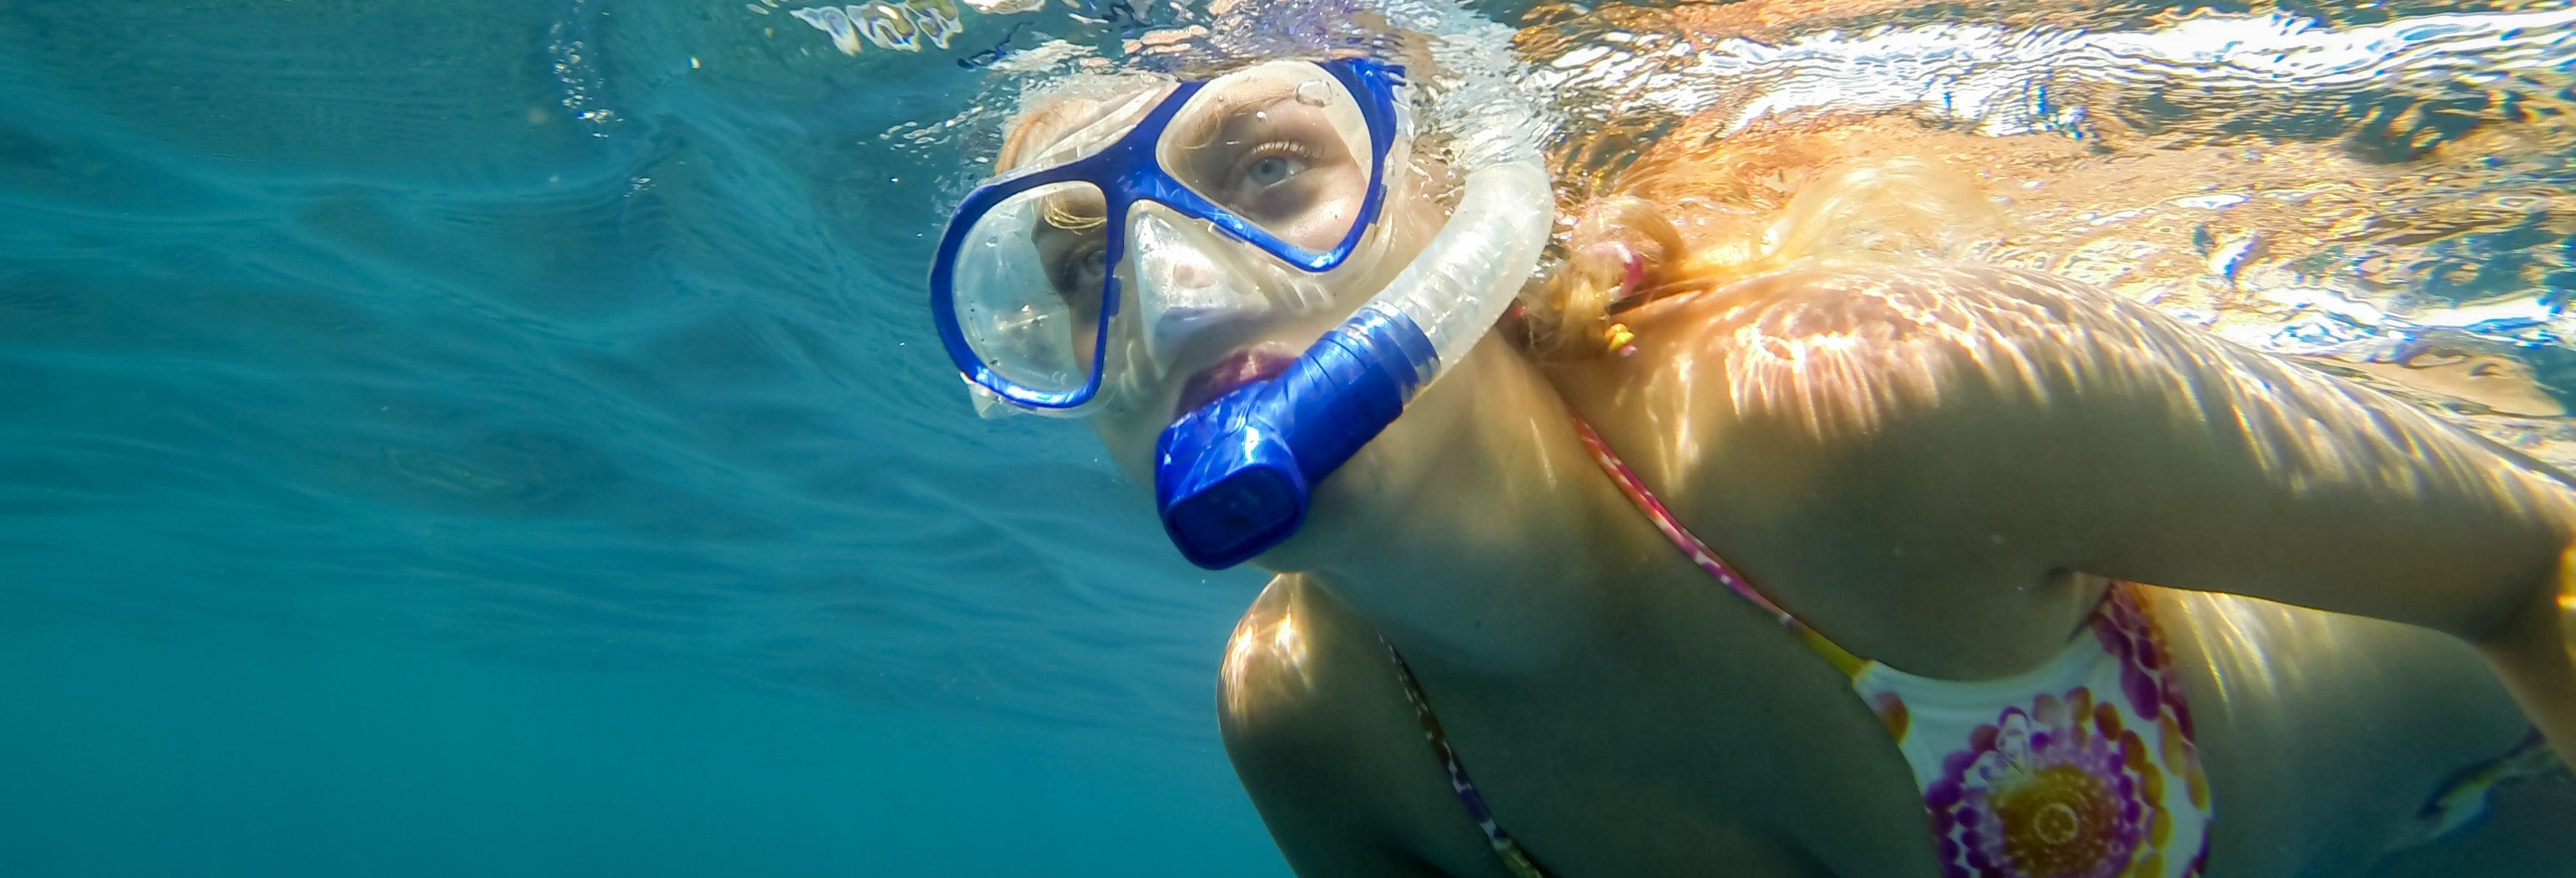 Snorkel en Costa Adeje